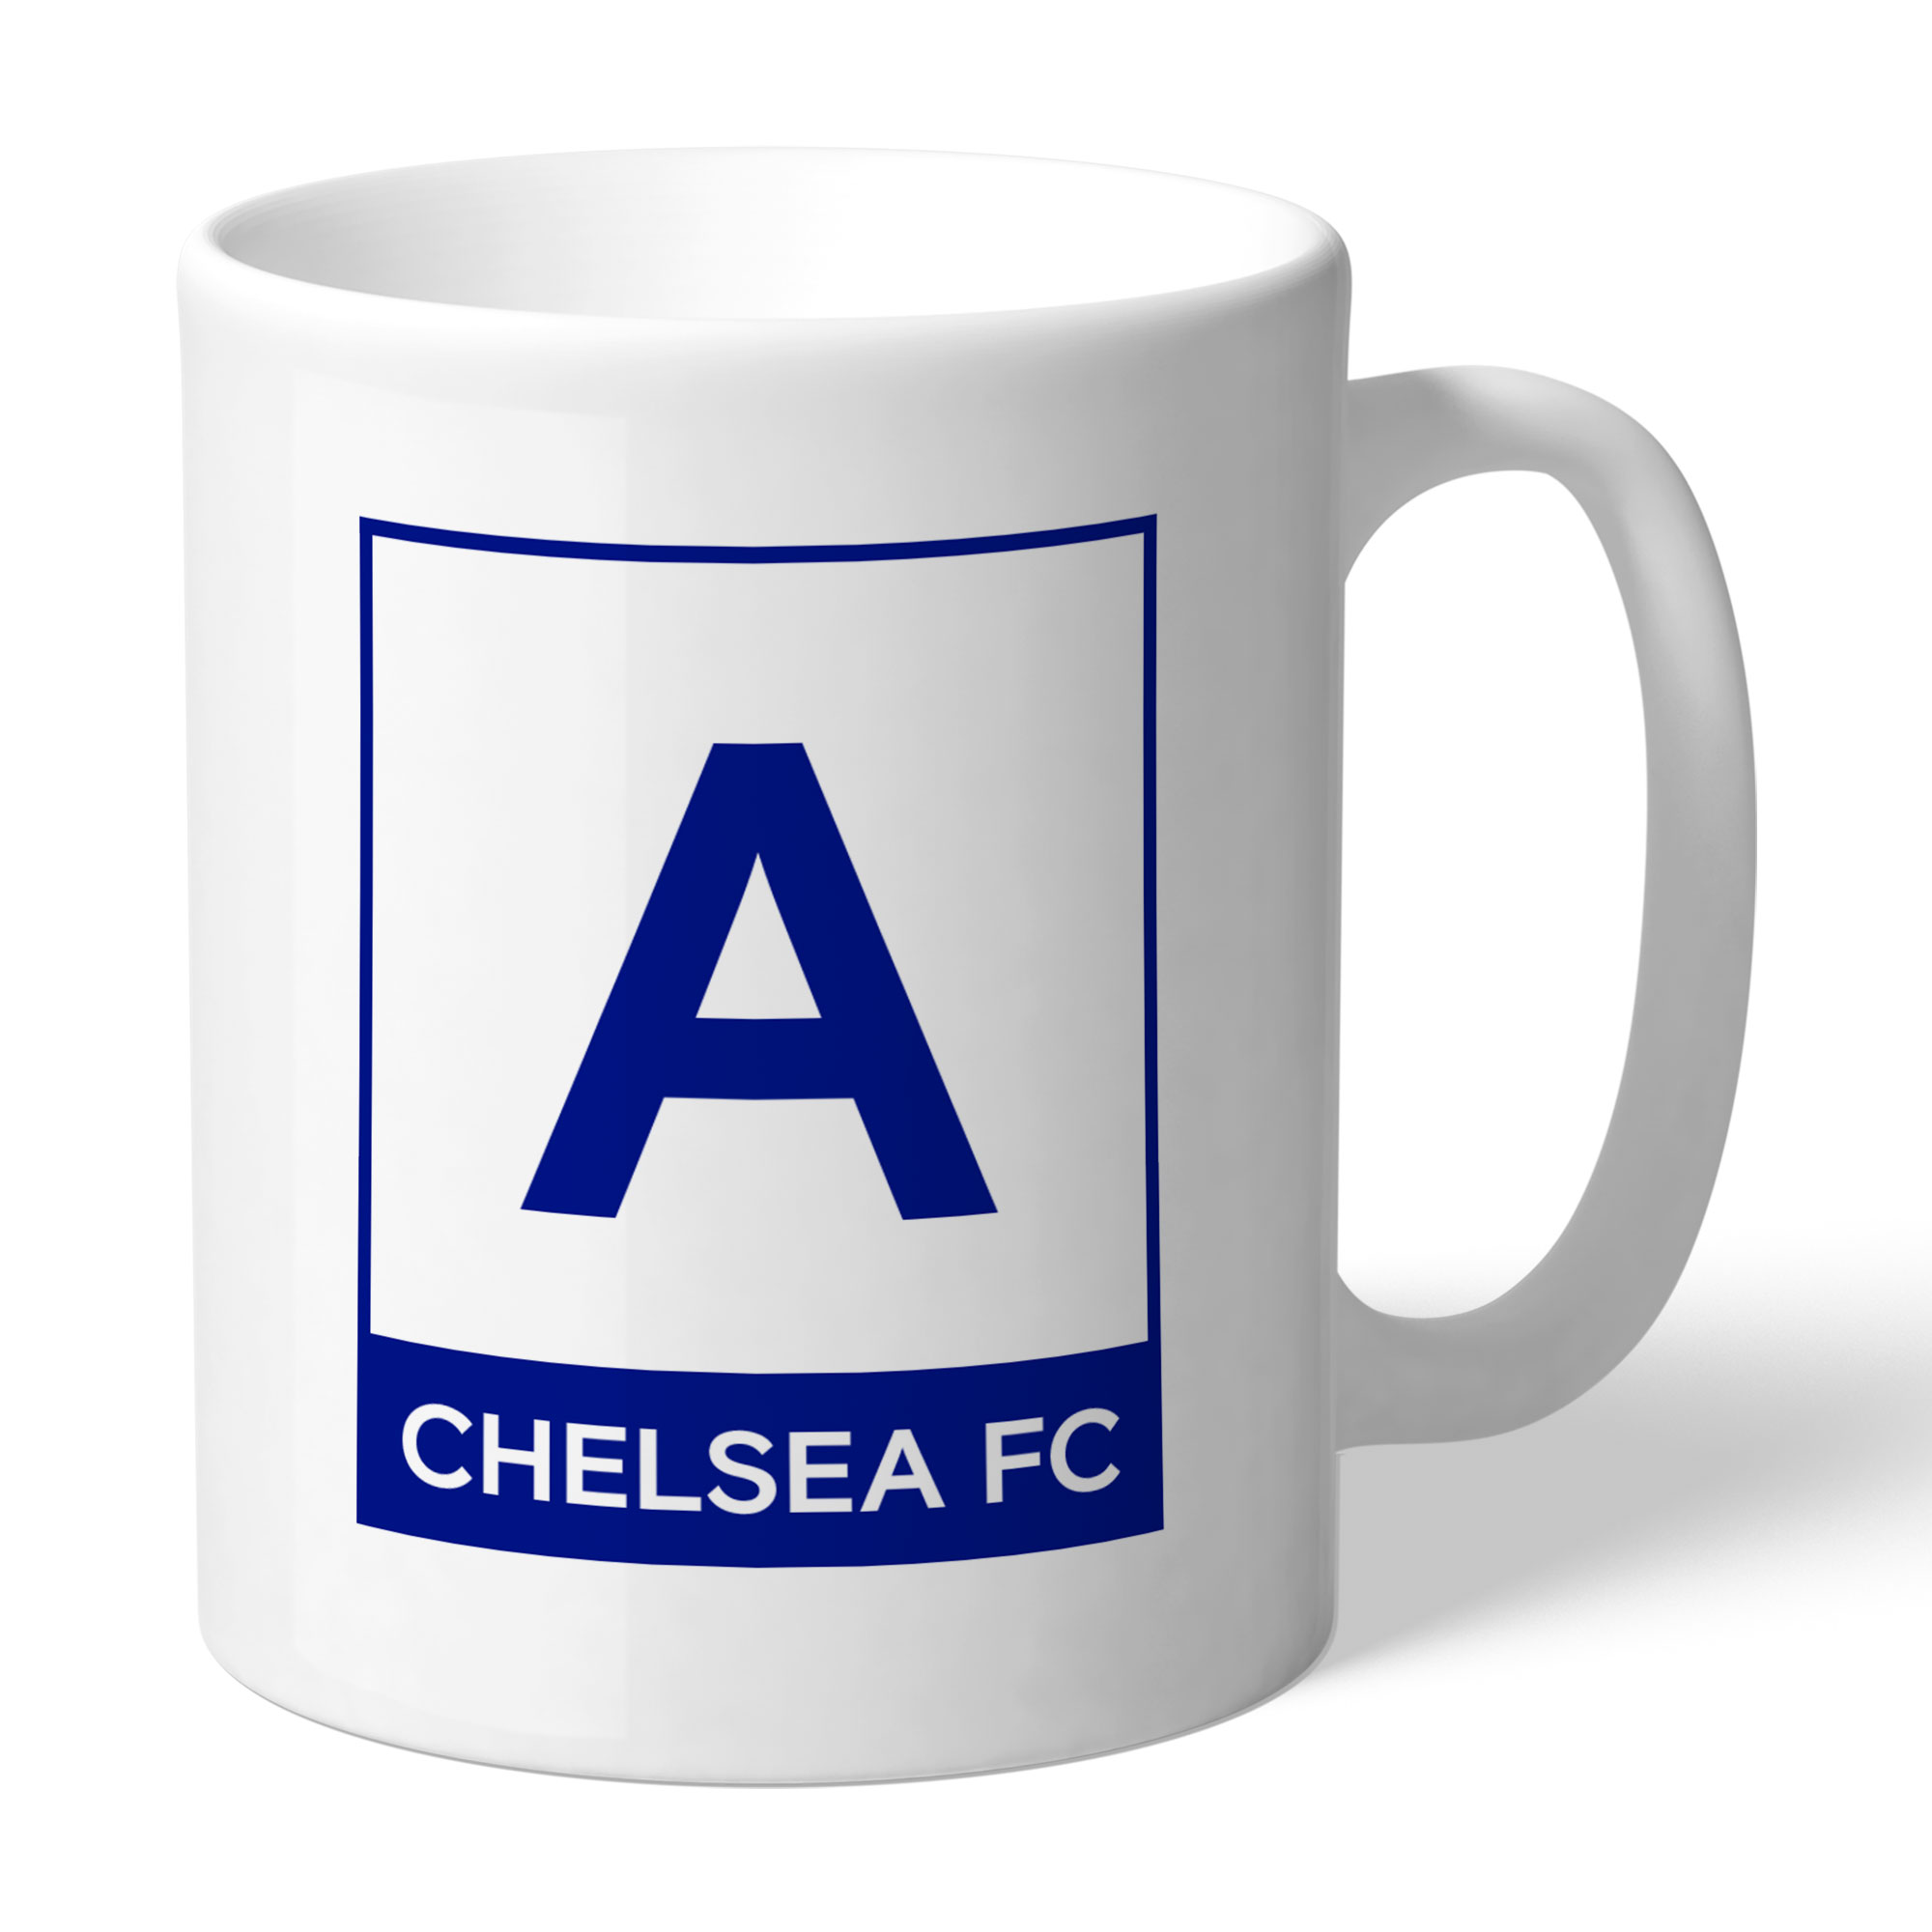 Chelsea FC Monogram Mug